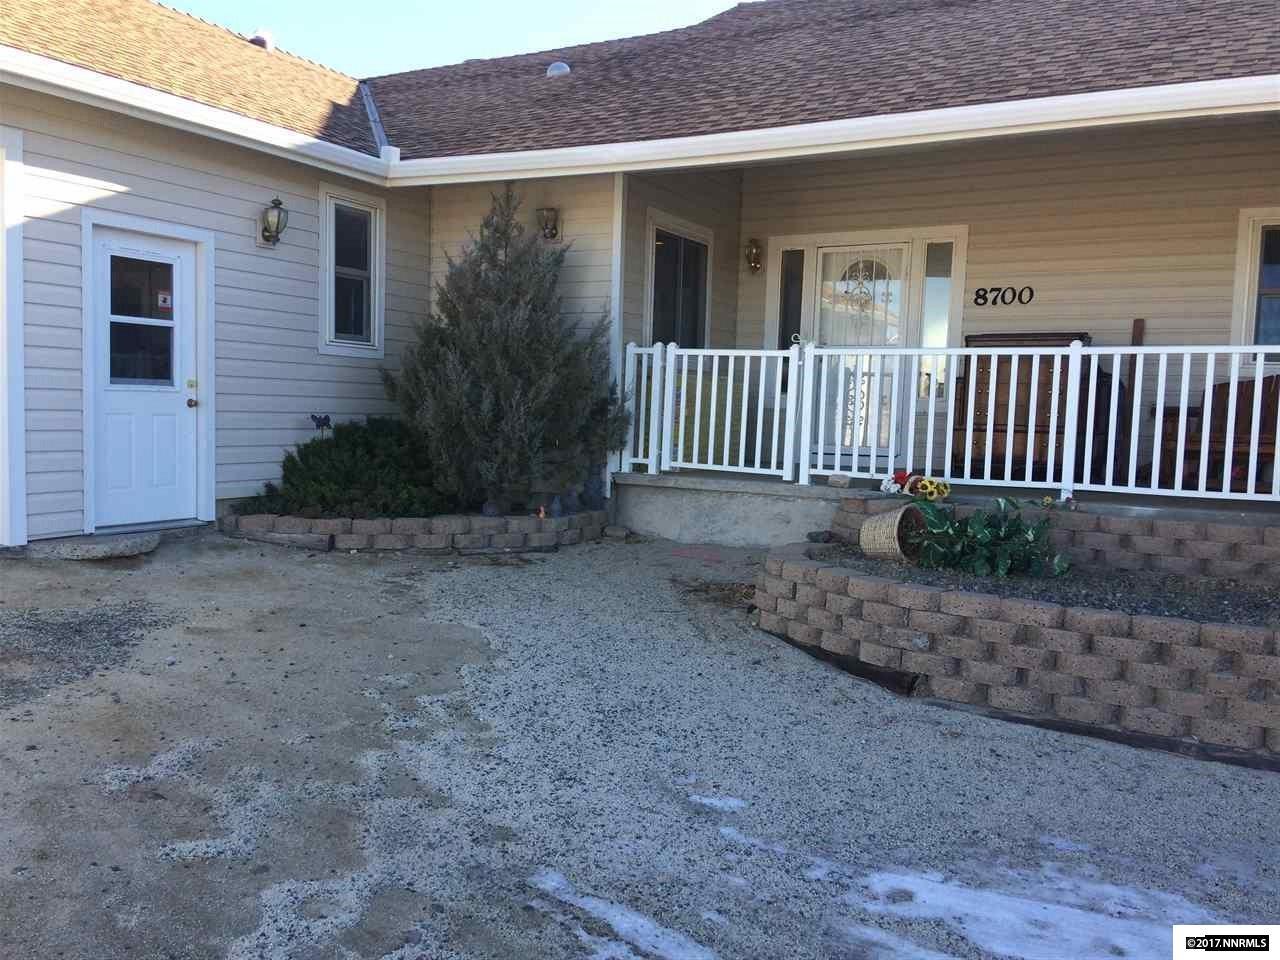 Image for 8700 Osage Road, Reno, NV 89508